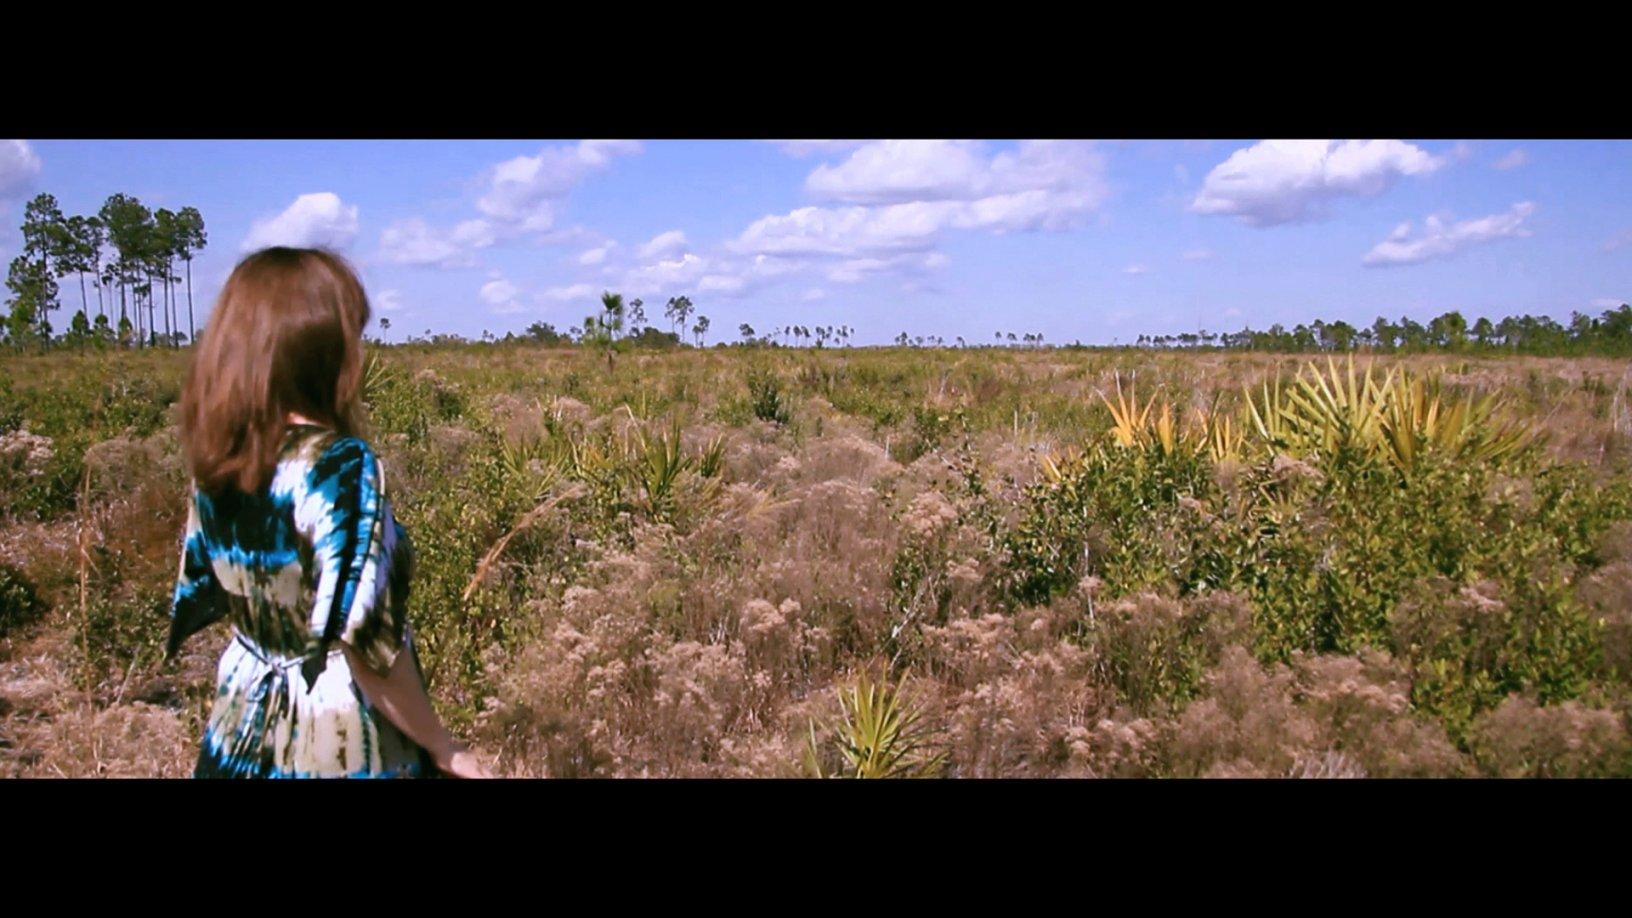 Walking Prairie (2013) - Simone Stoll